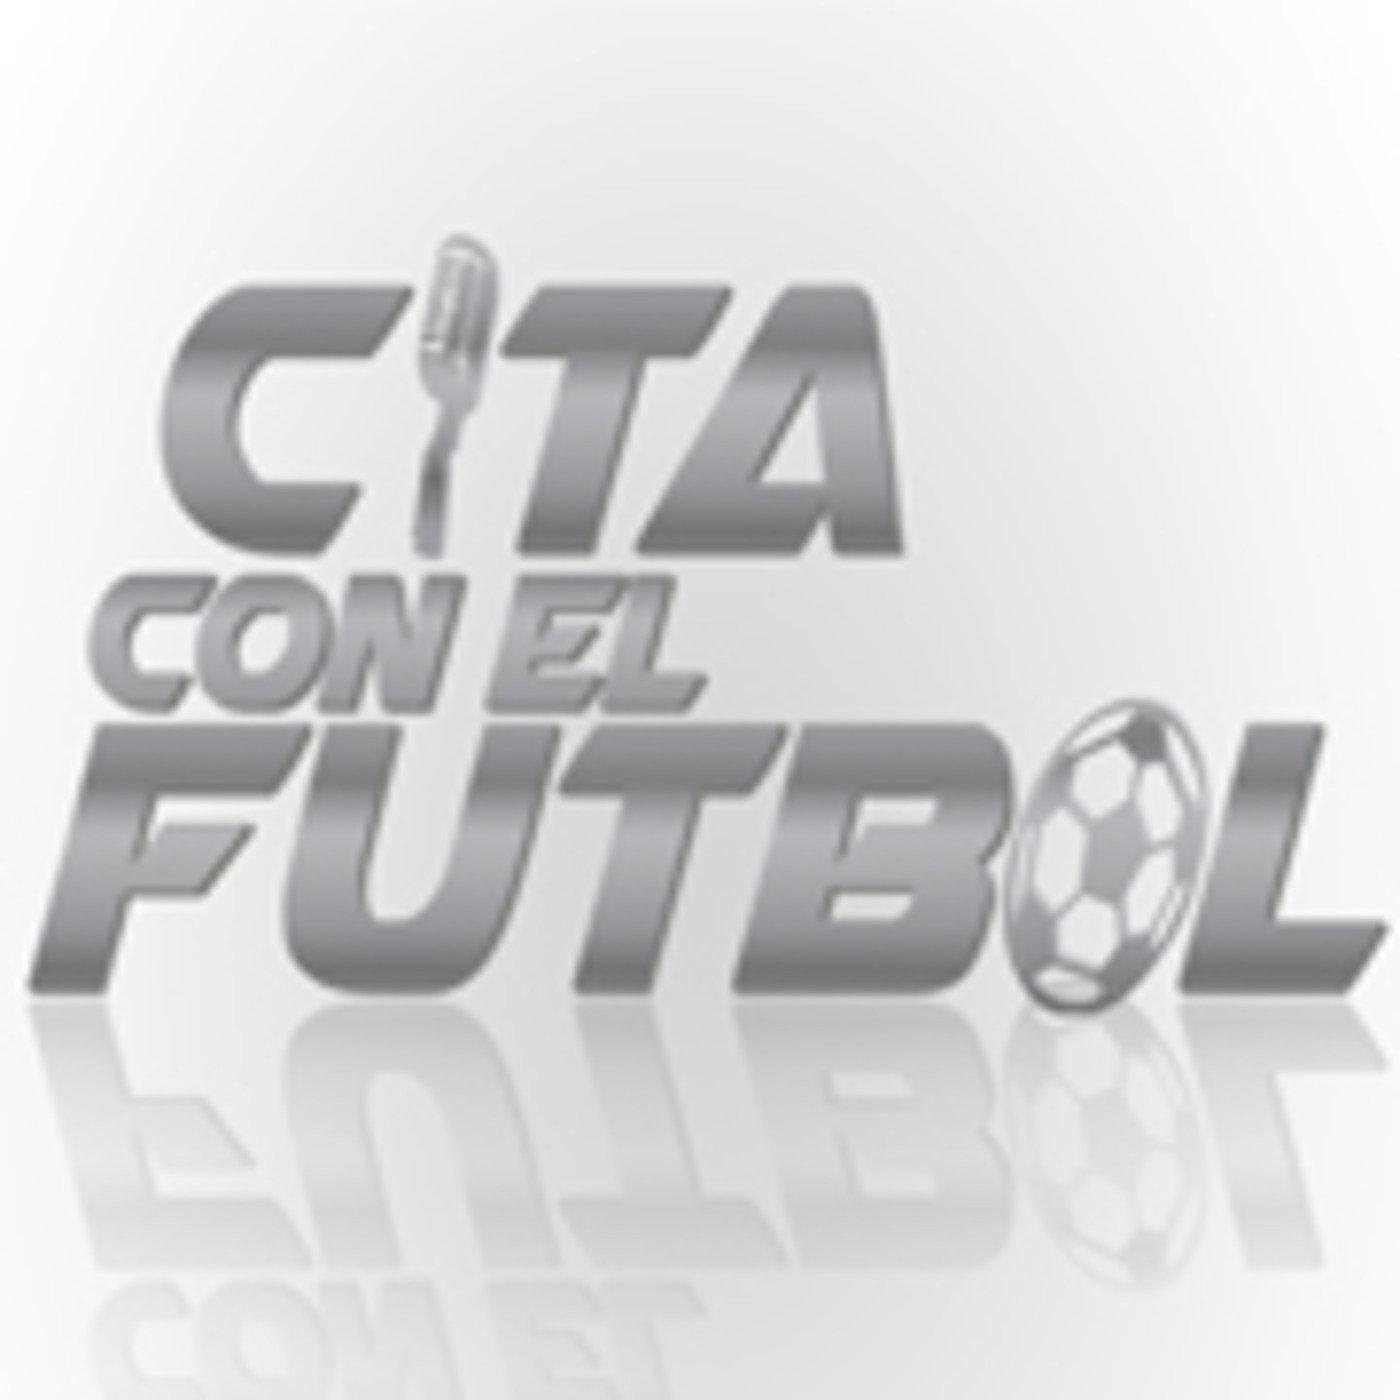 <![CDATA[Podcast de Cita con el Futbol]]>